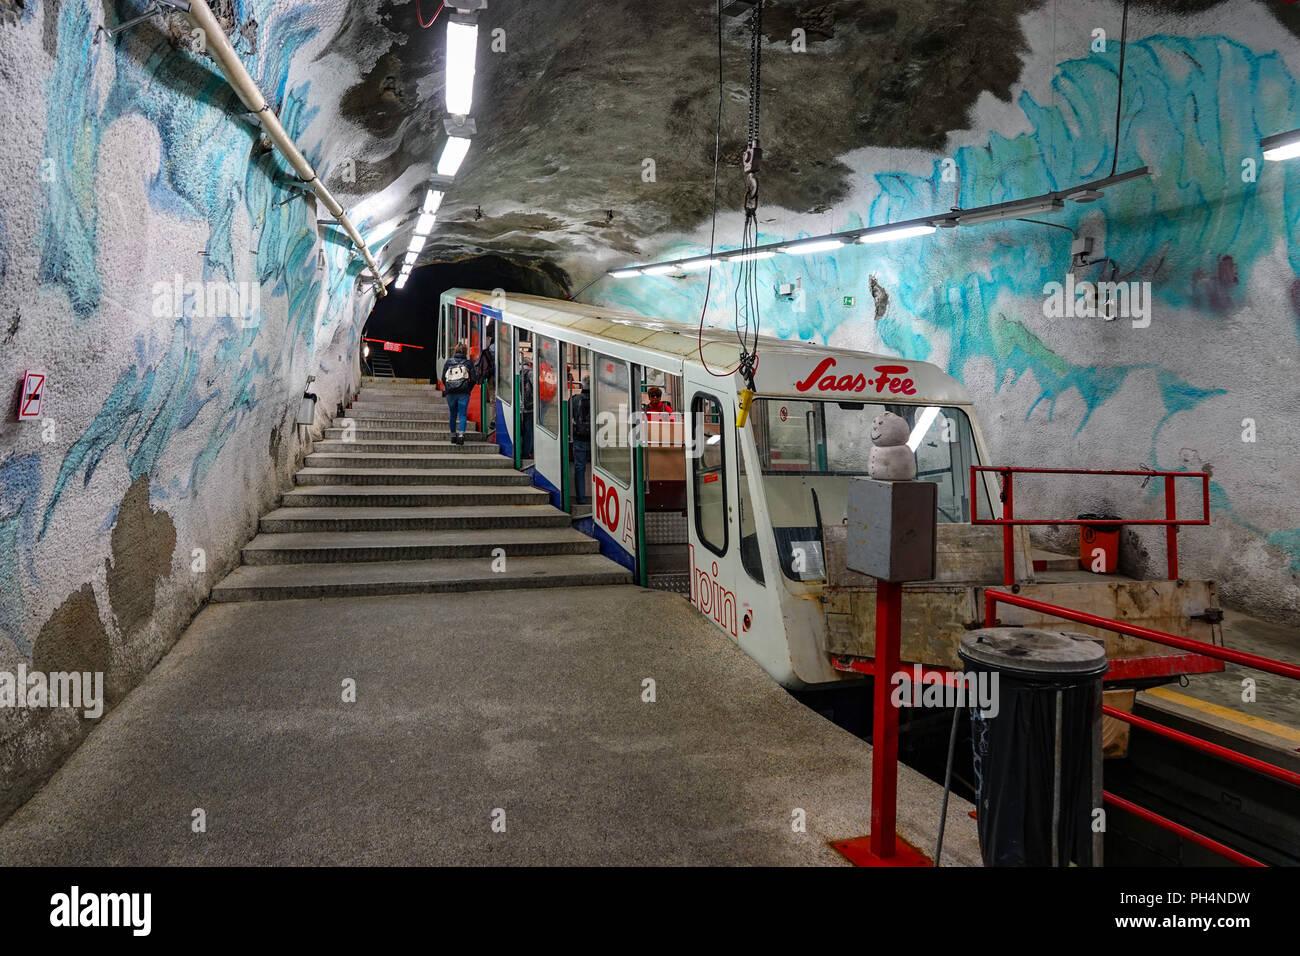 Metro train alpin, Saas Fee, Mittelallalin de ski d'été, Saastal, Suisse, Photo Stock